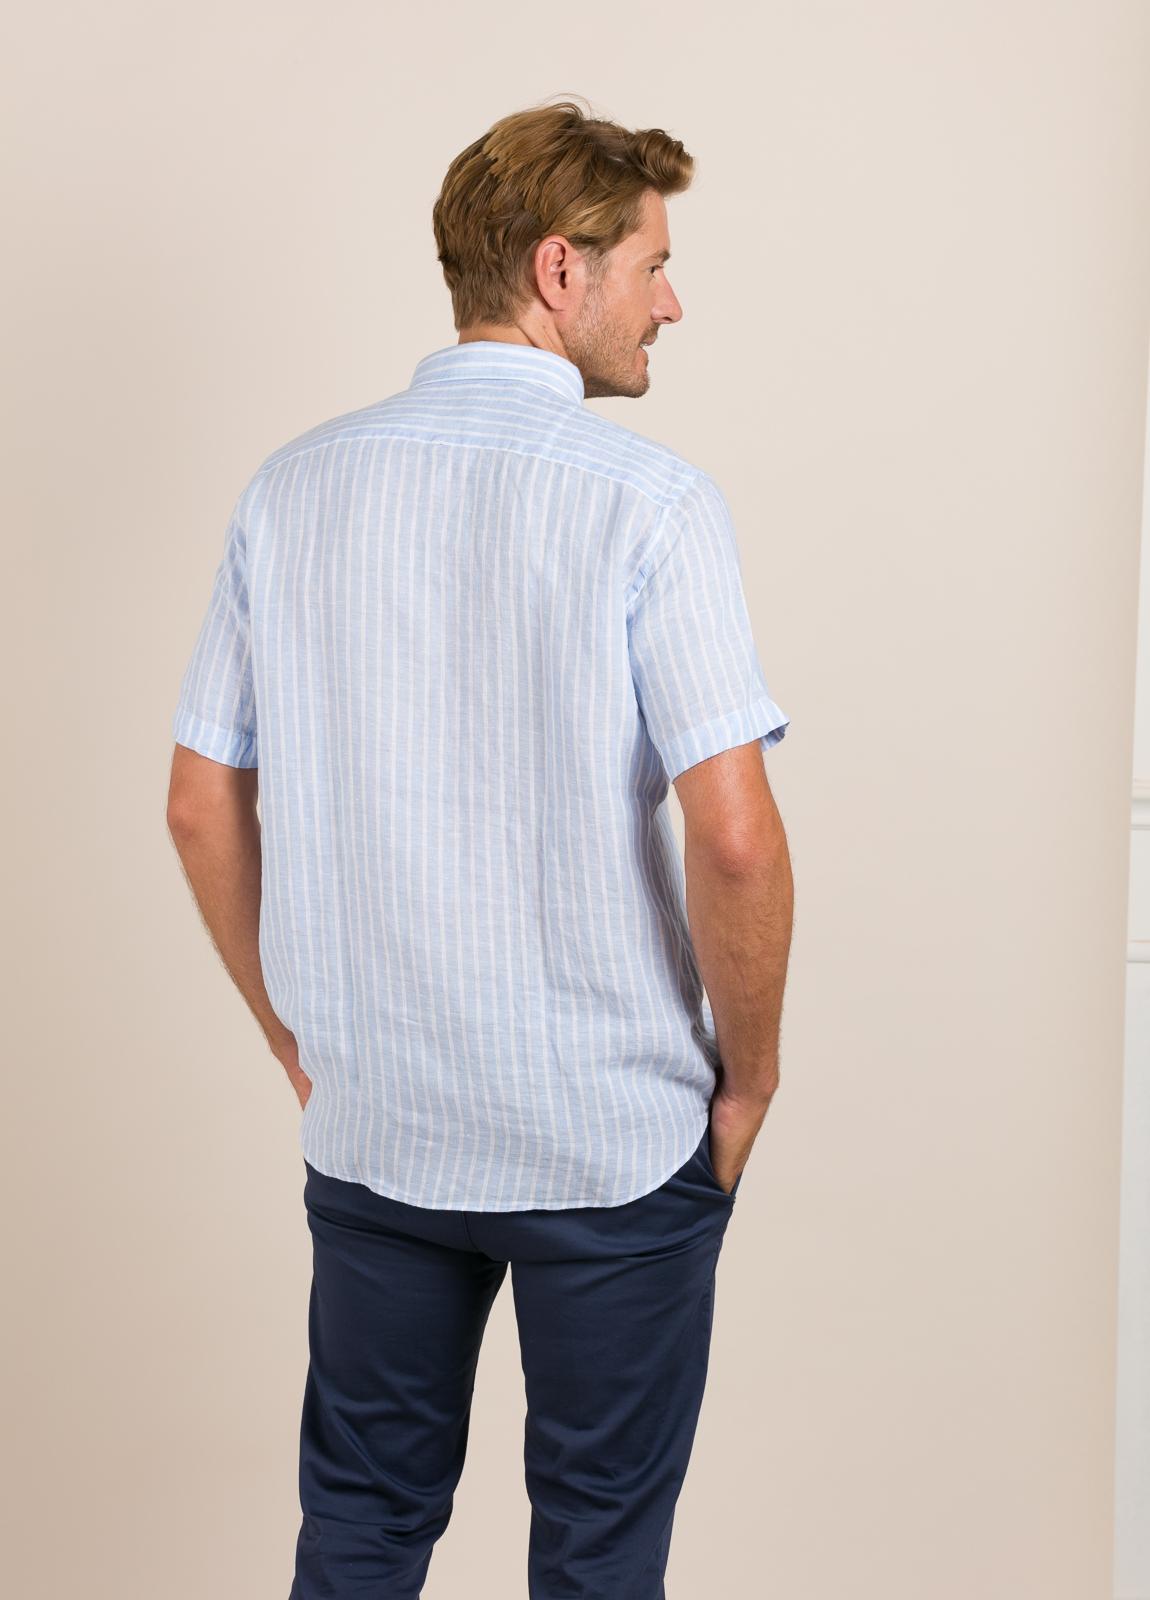 Camisa M/Corta sport FUREST COLECCIÓN Regular FIT Lino rayas celeste - Ítem3